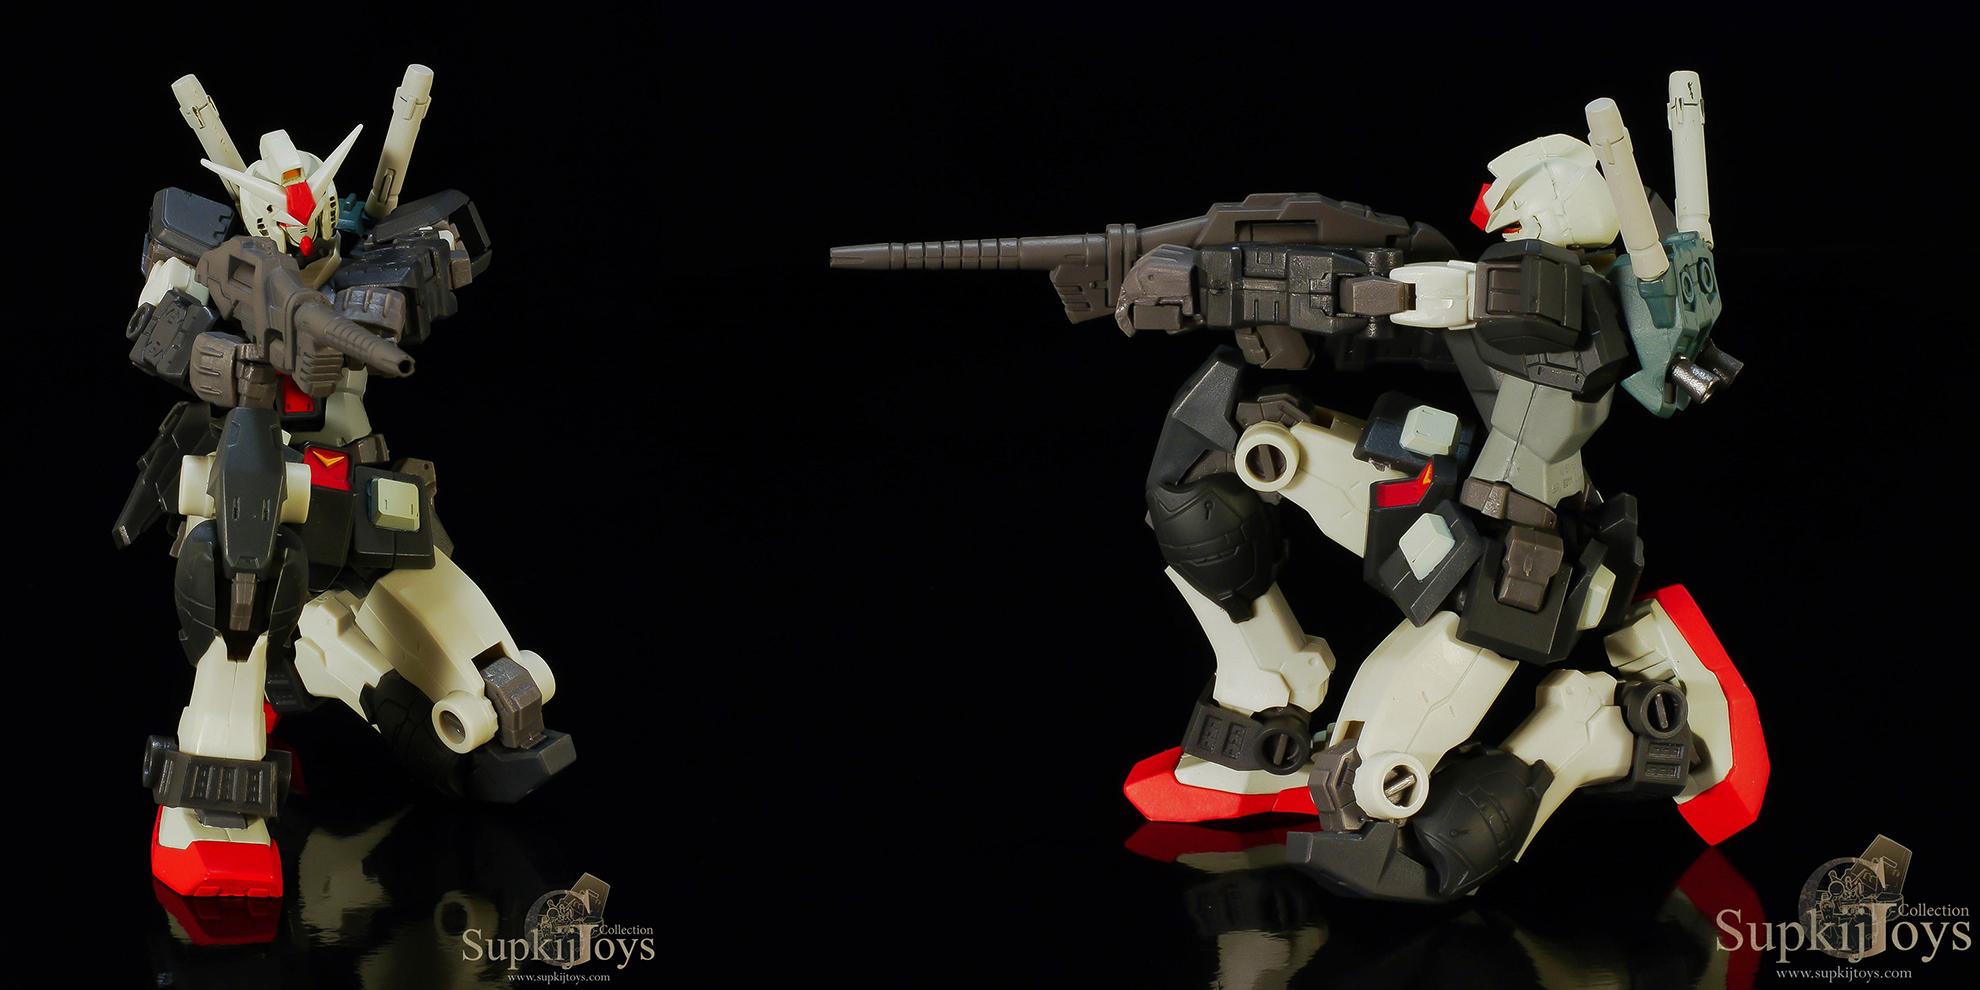 Banpresto Gundam Series Special Creative Model EX Mobile Suit Gundam MSV 2 - RX-78-1 Prototype Gundam & MS-06R-2 Zaku II High Mobility Type [Johnny Ridden's Custom]